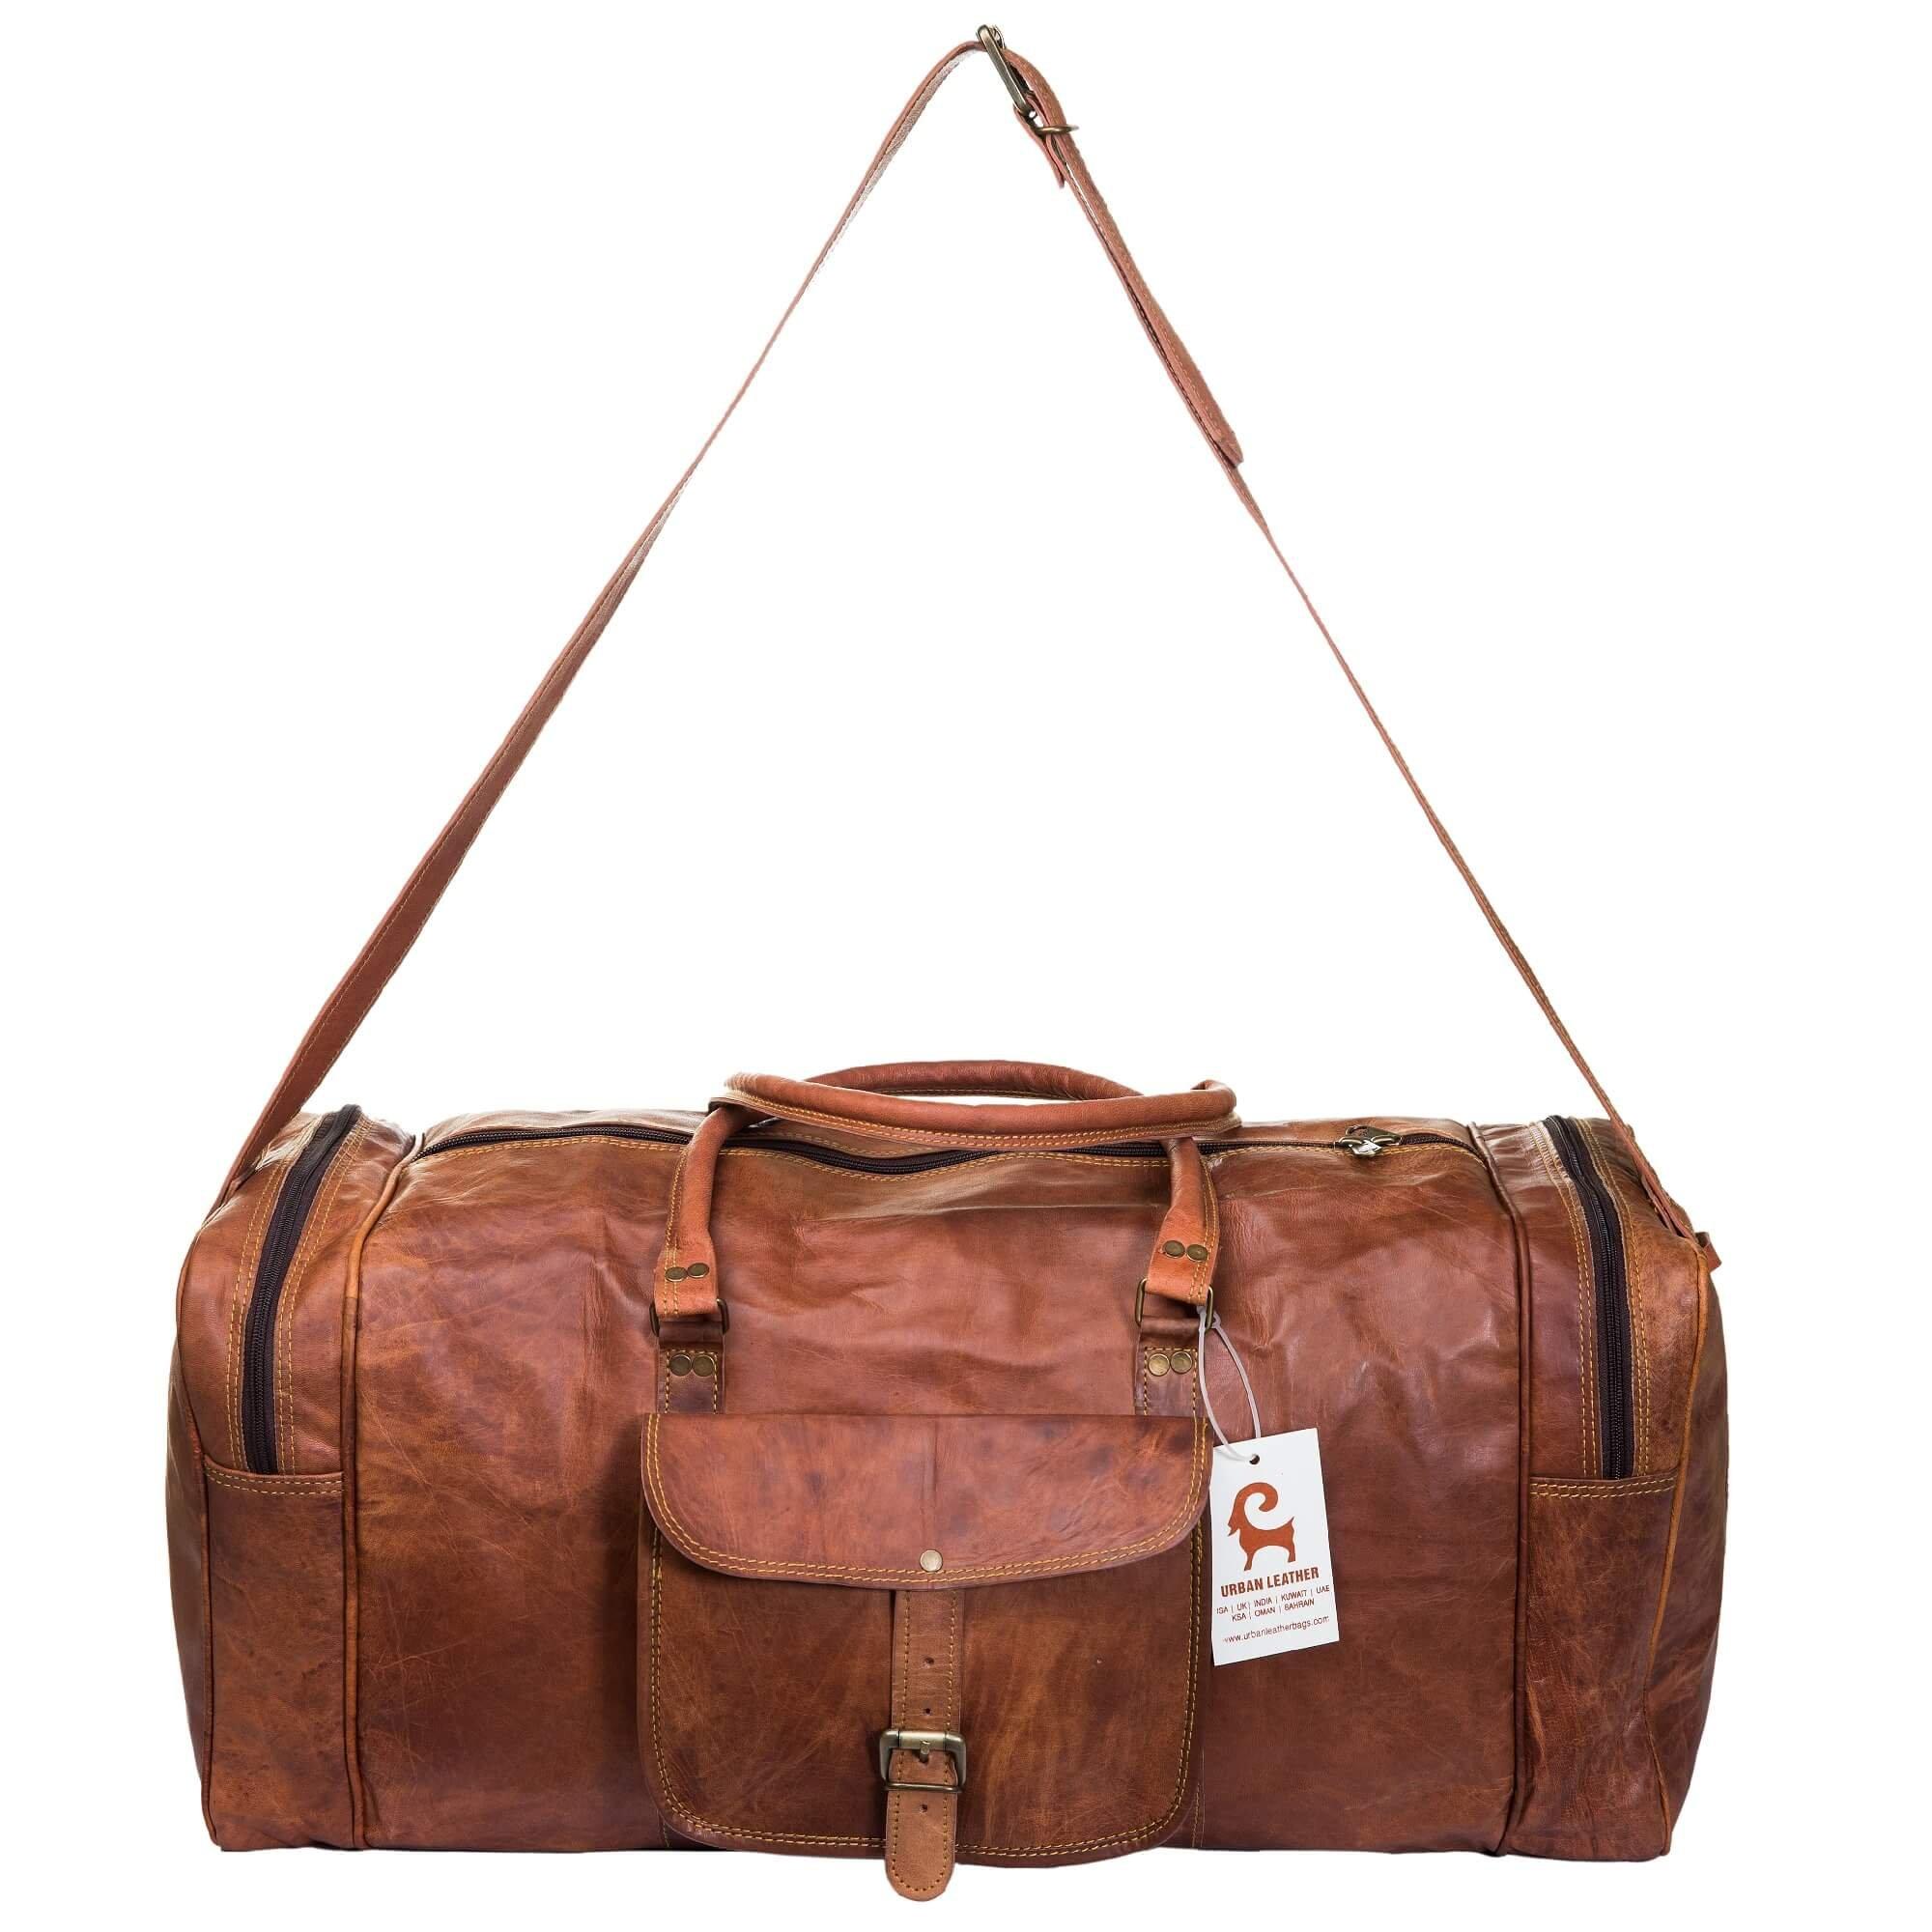 Urban Leather Handmade Travel Duffle Bag Vintage Retro Style Bag Overnight Weekender Bag Size 24 Inch